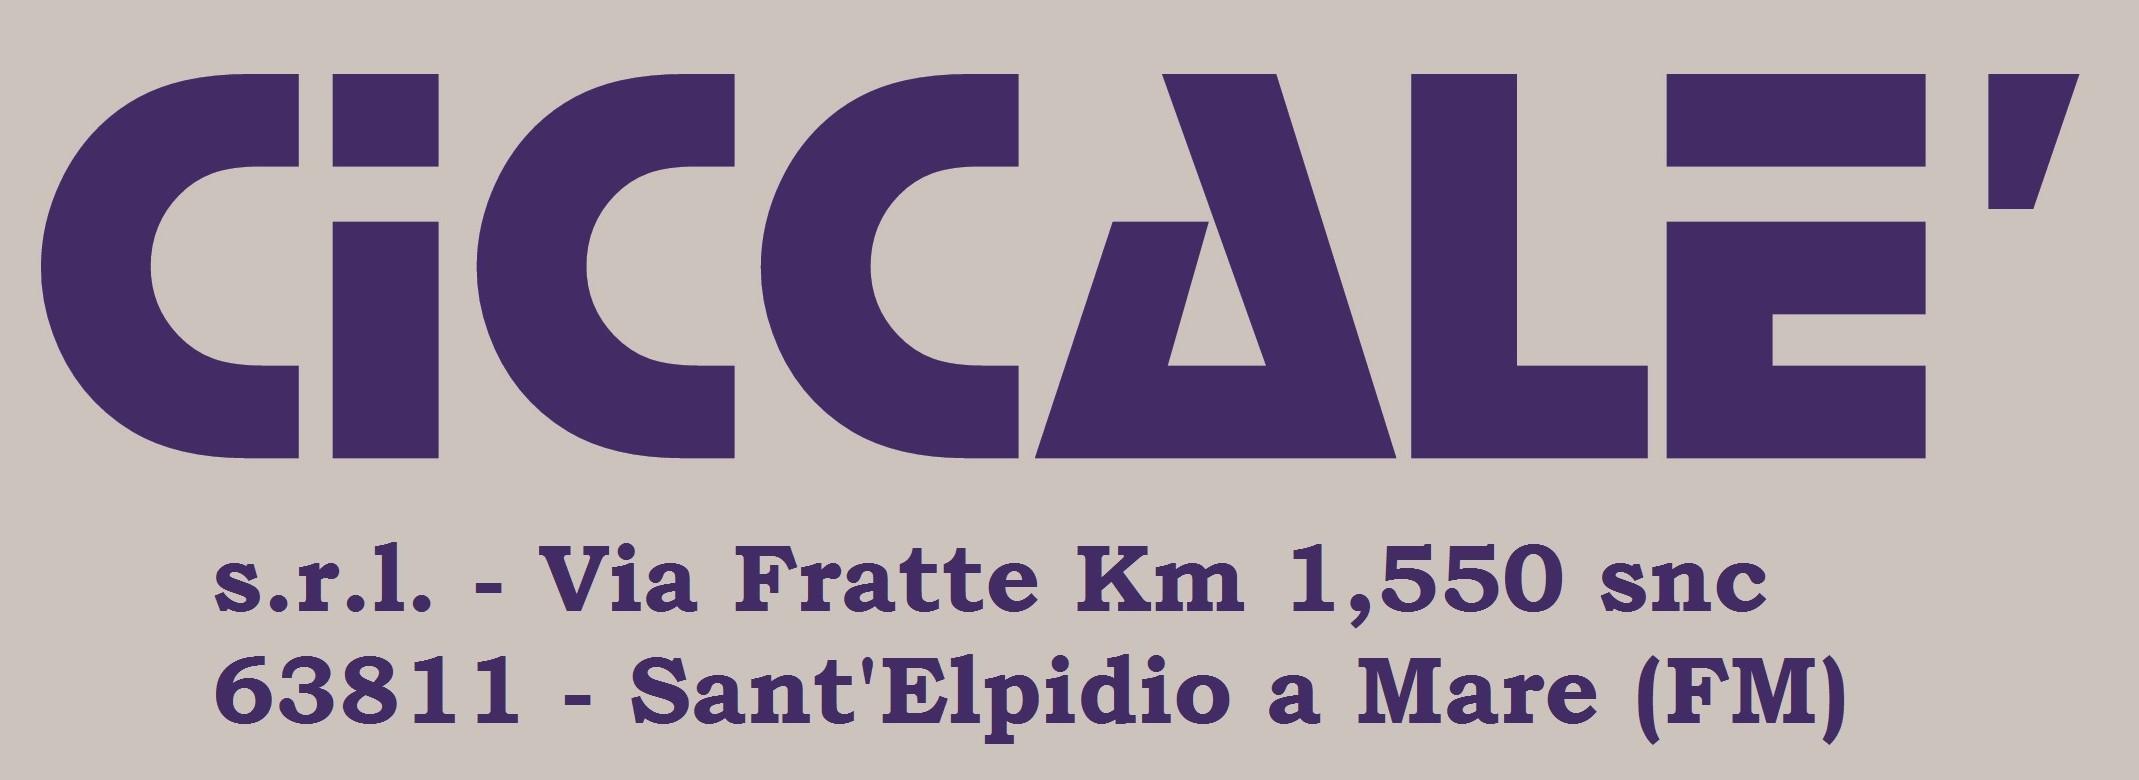 Ciccalè-indirizzo